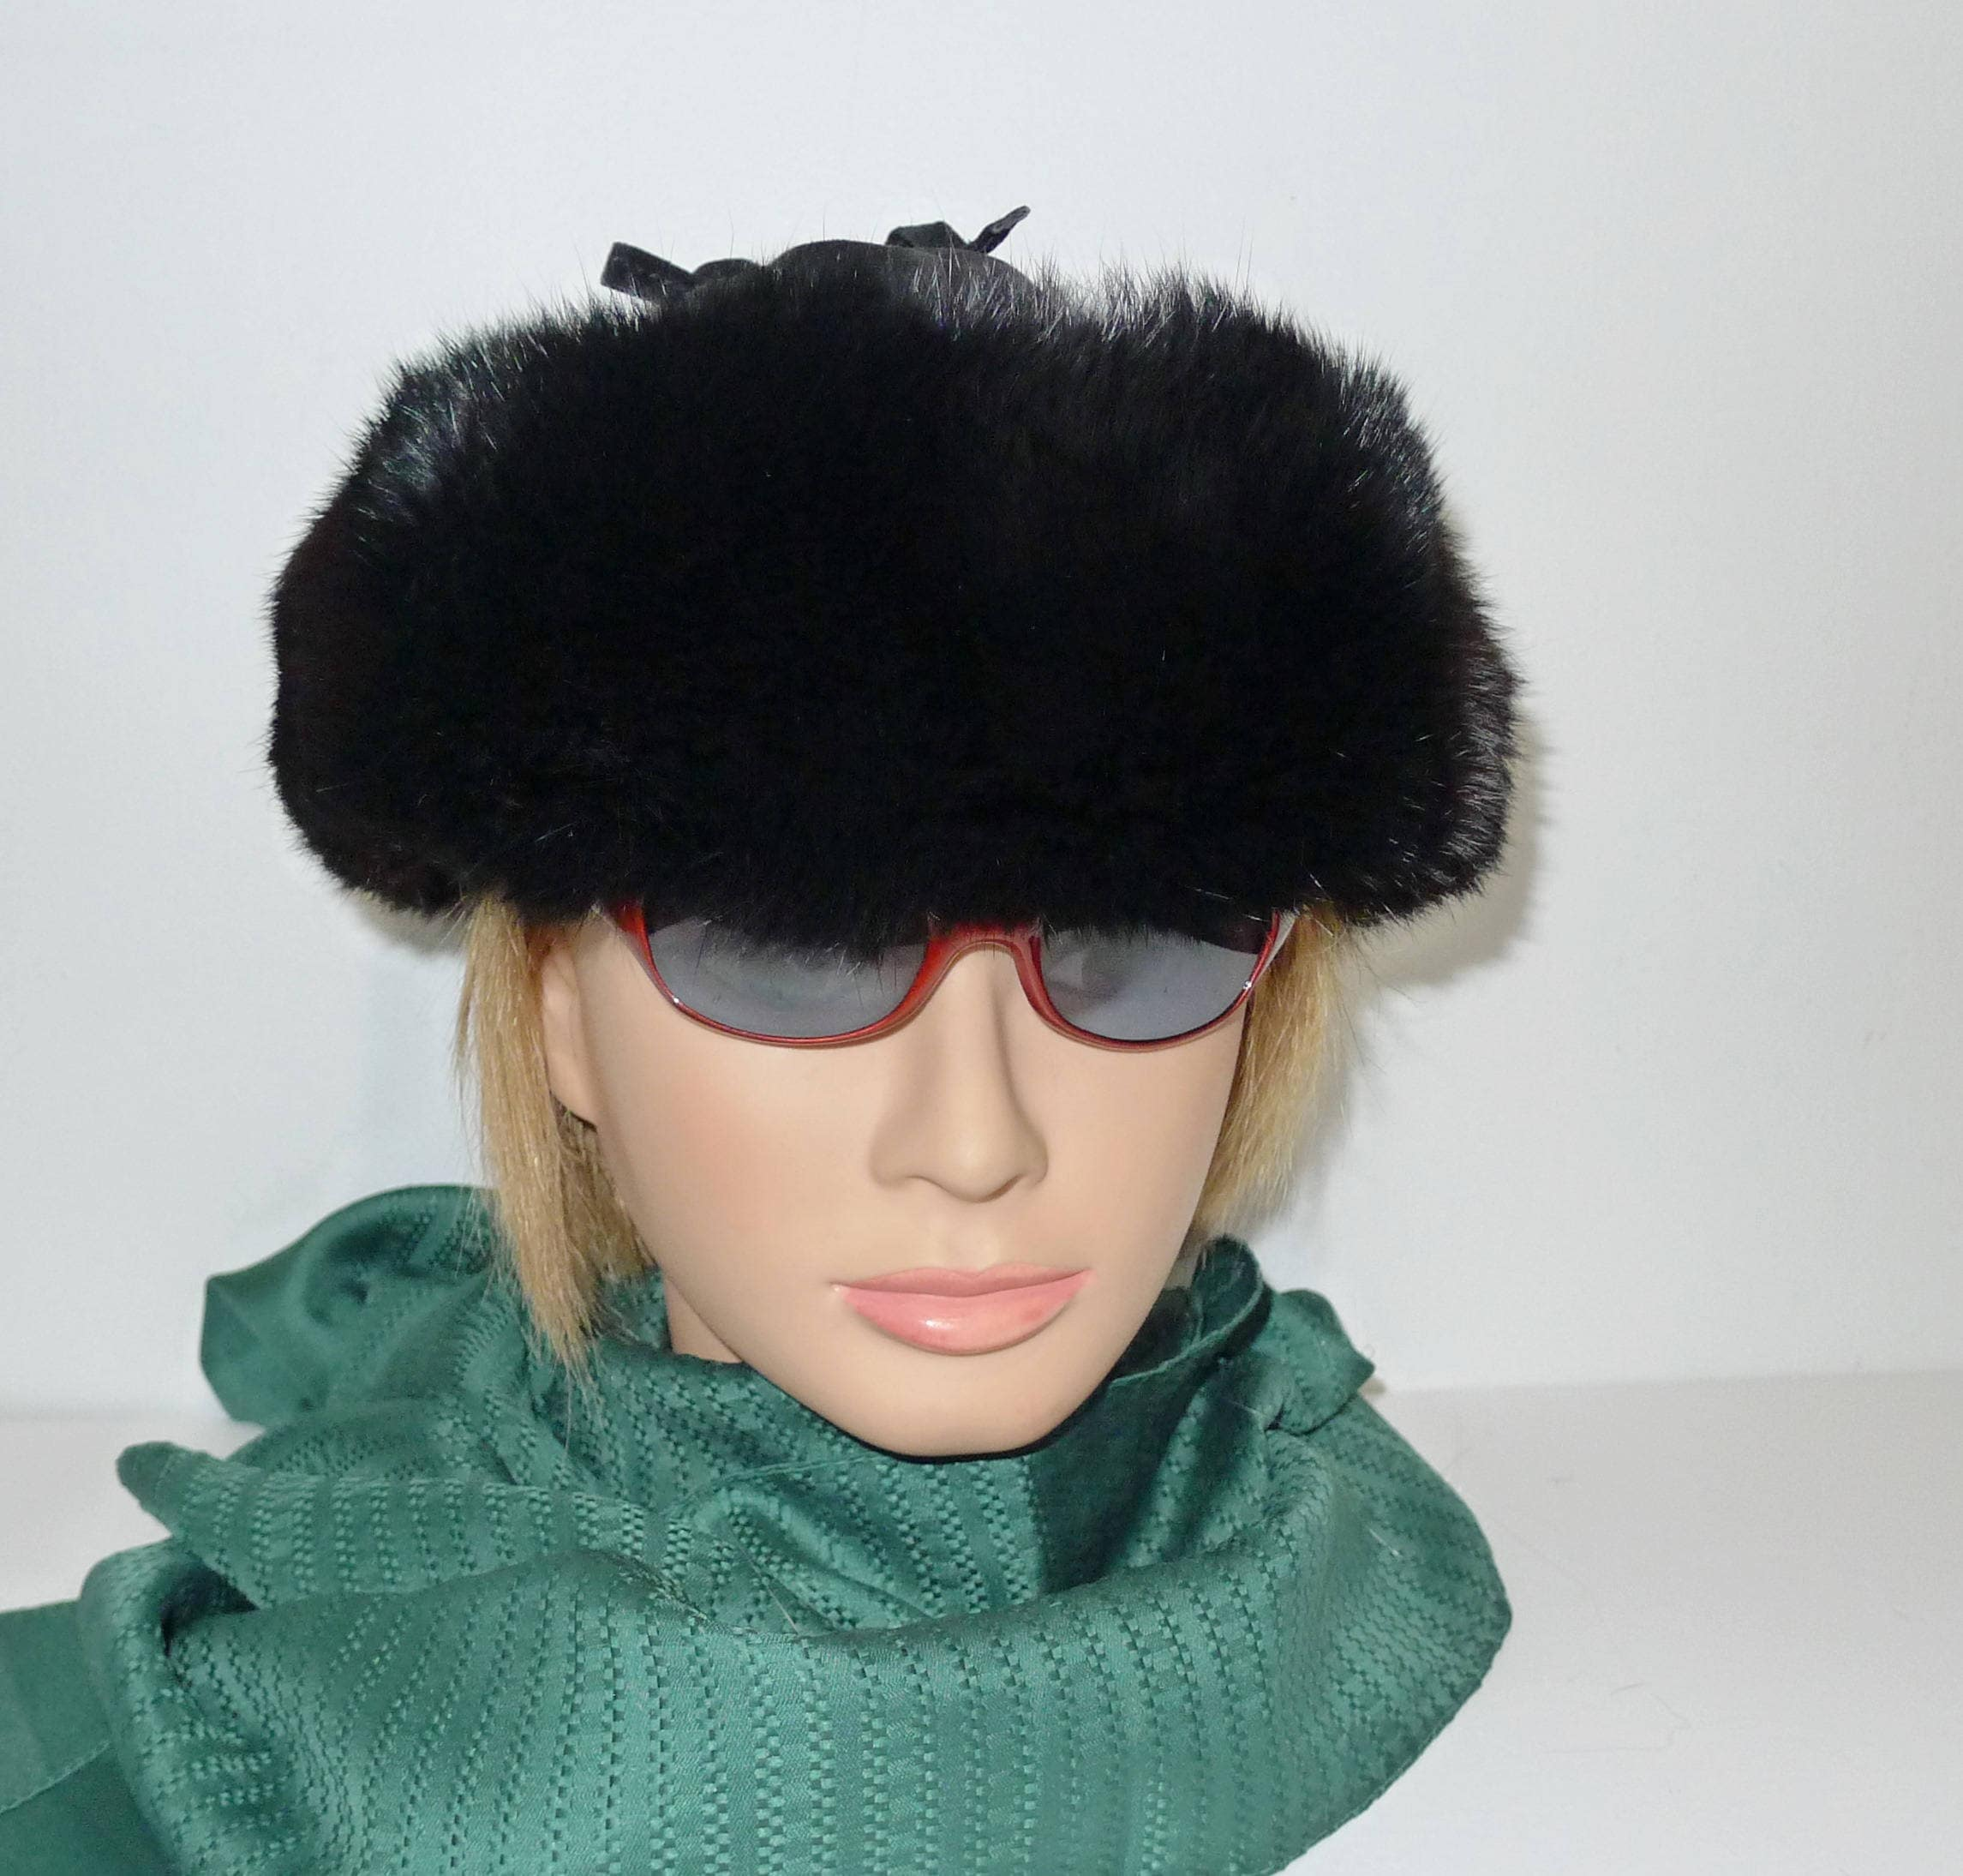 Pretty genuine black rabbit fur trooper ushanka style hat  c89ec38956f